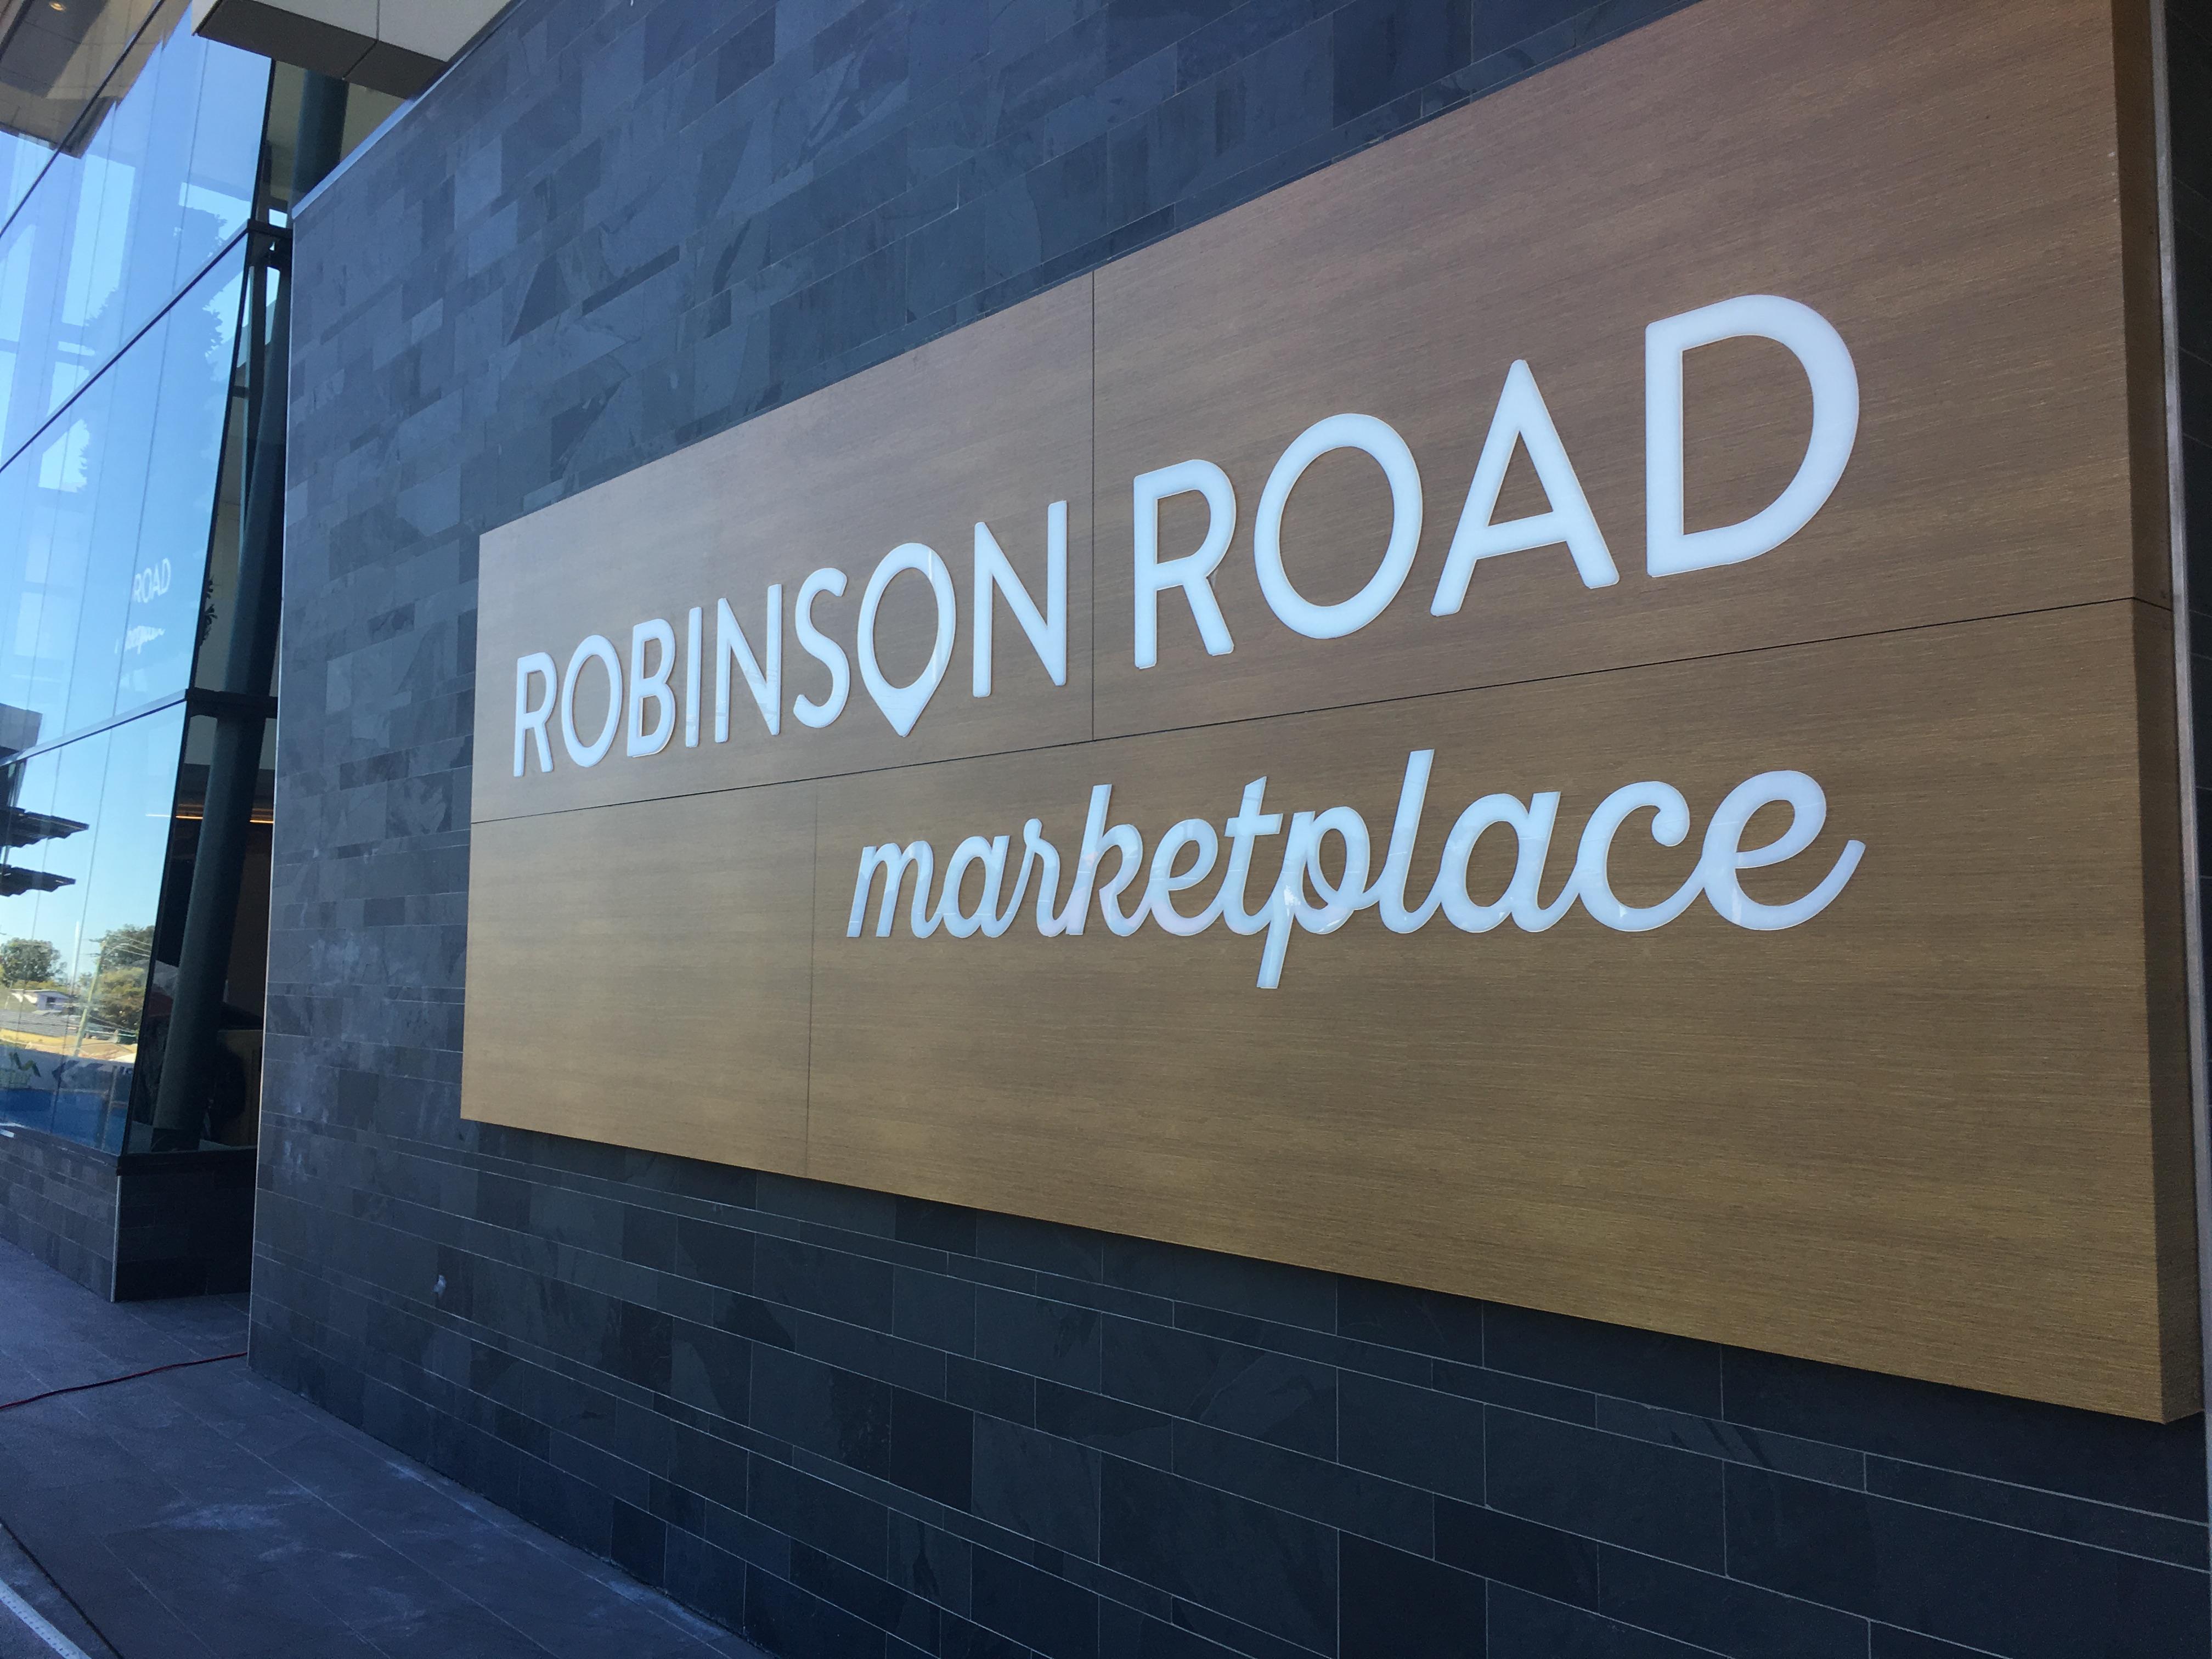 Robinson Road Marketplace - Redevelopment June 2017